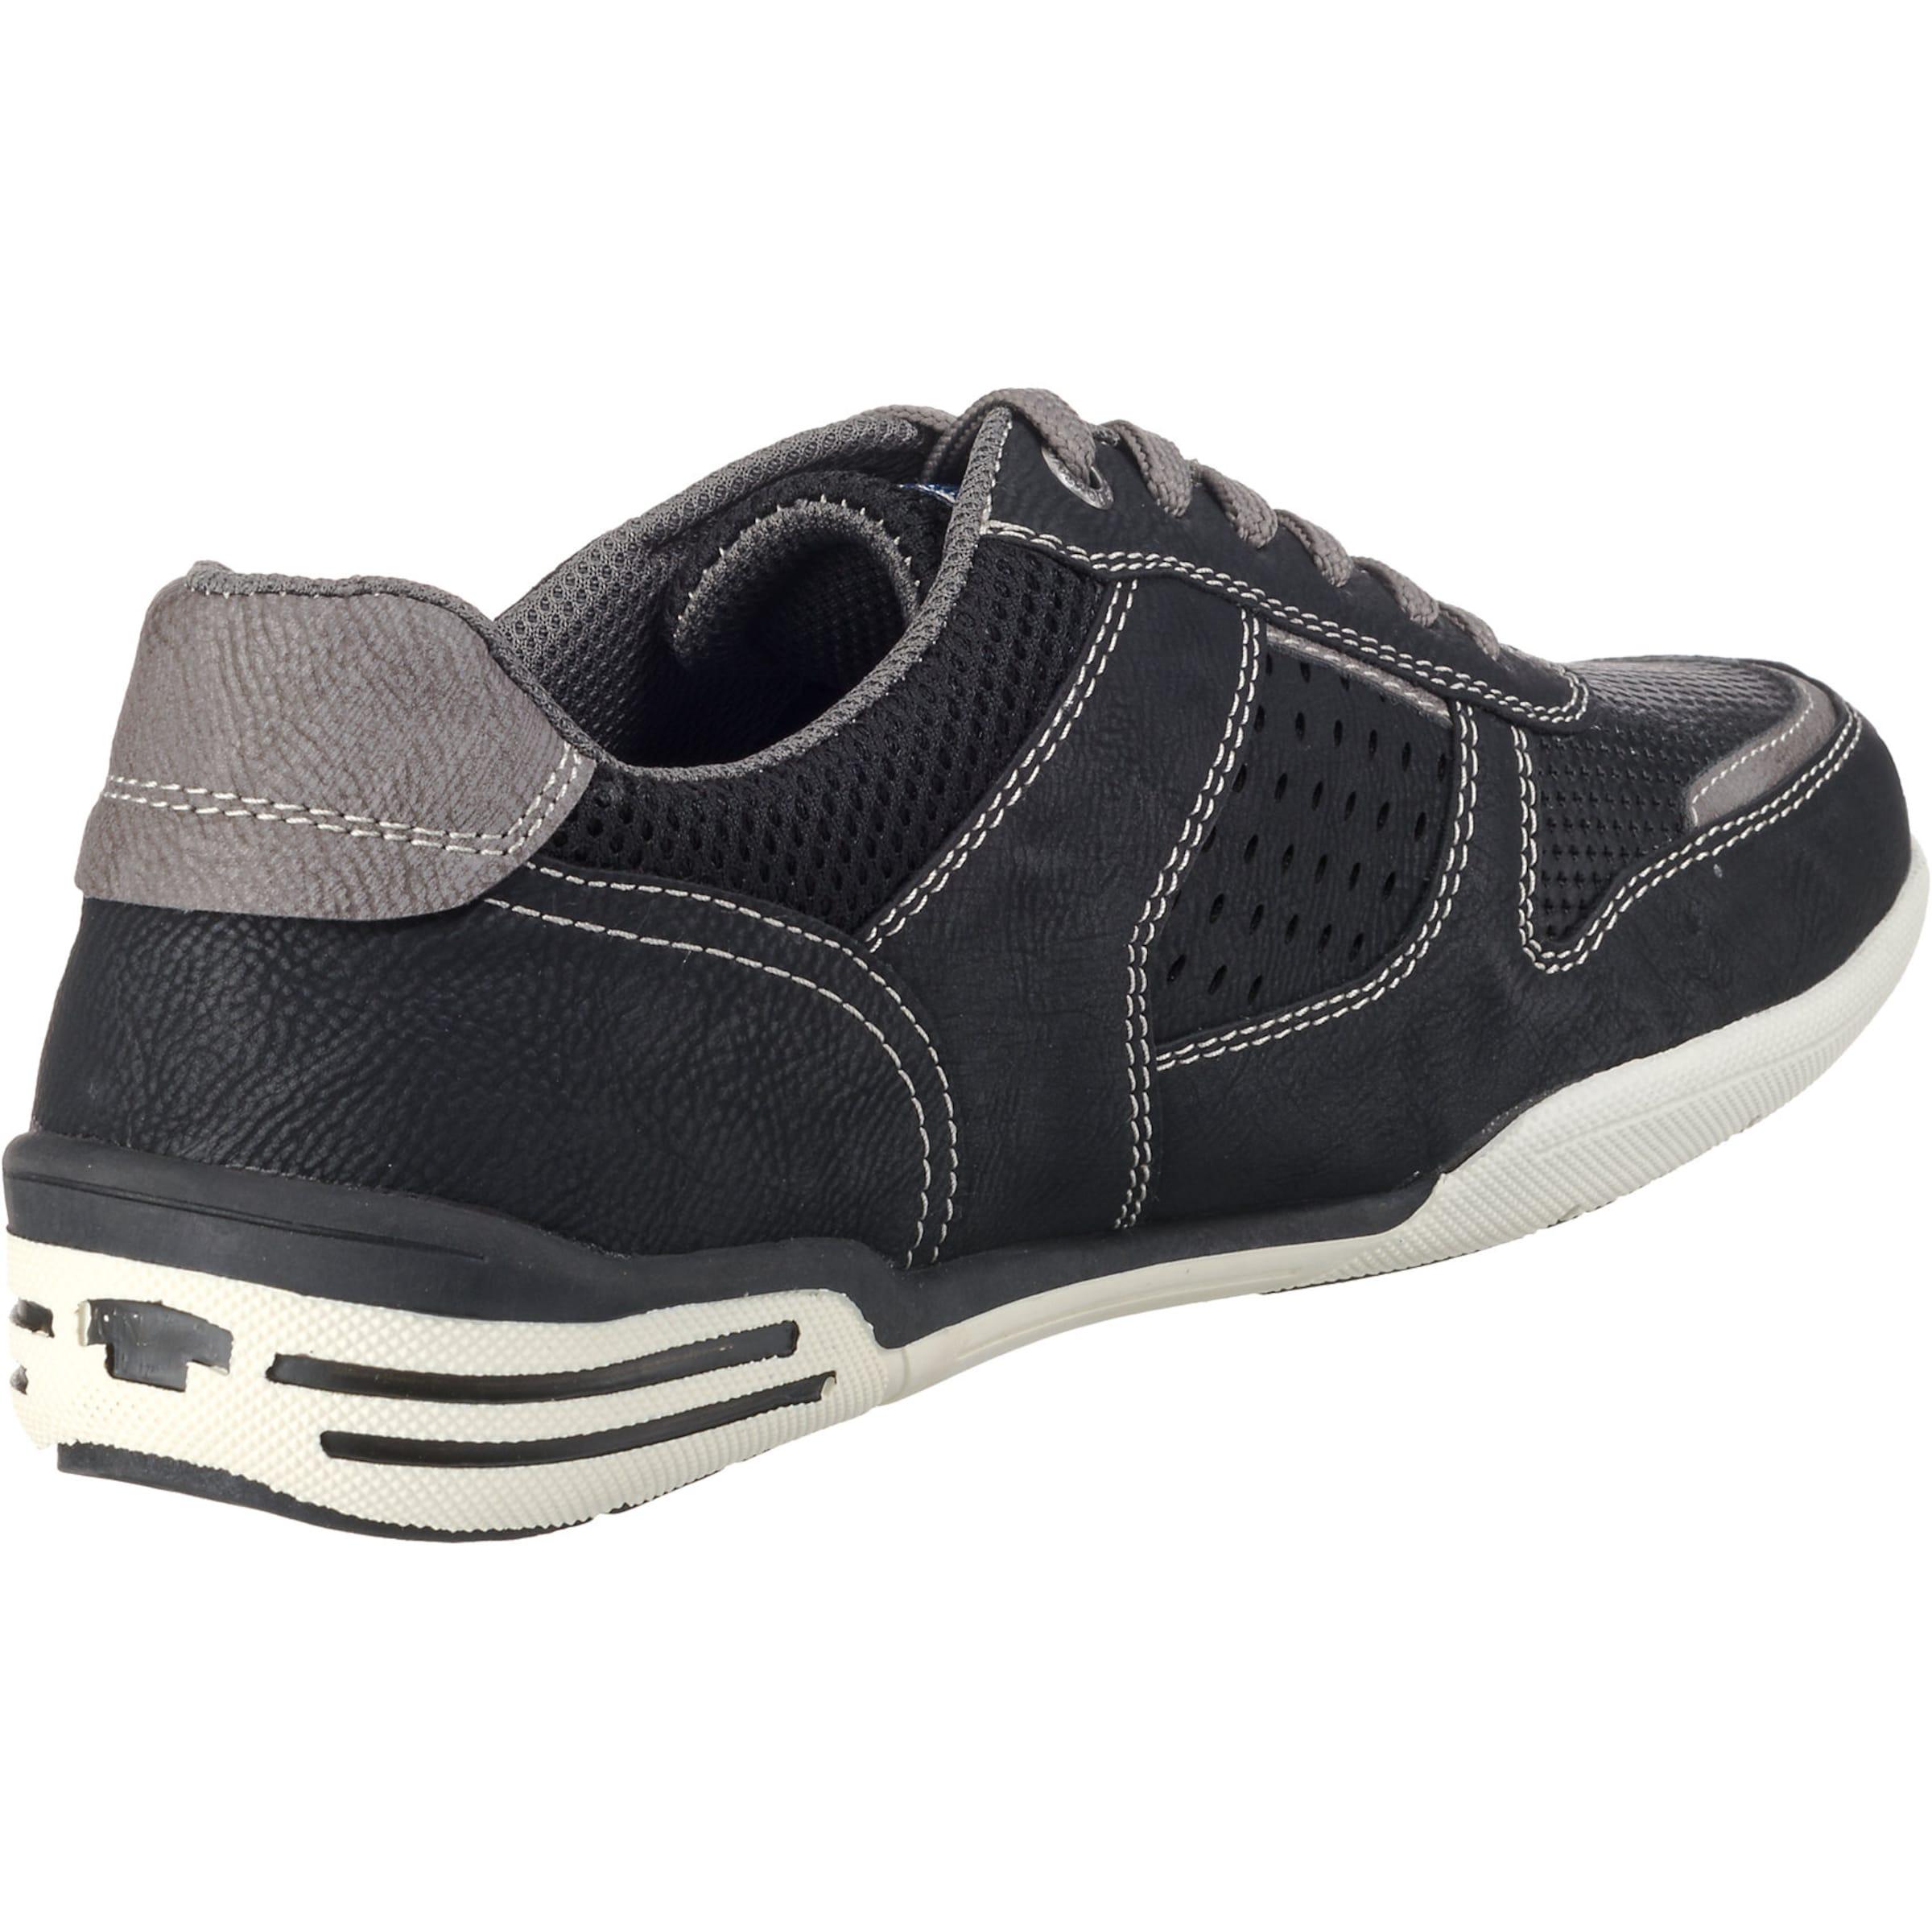 Tailor Tom In In Sneakers Tailor GrauSchwarz Sneakers Tailor Sneakers GrauSchwarz In Tom Tom GSVUMqpz